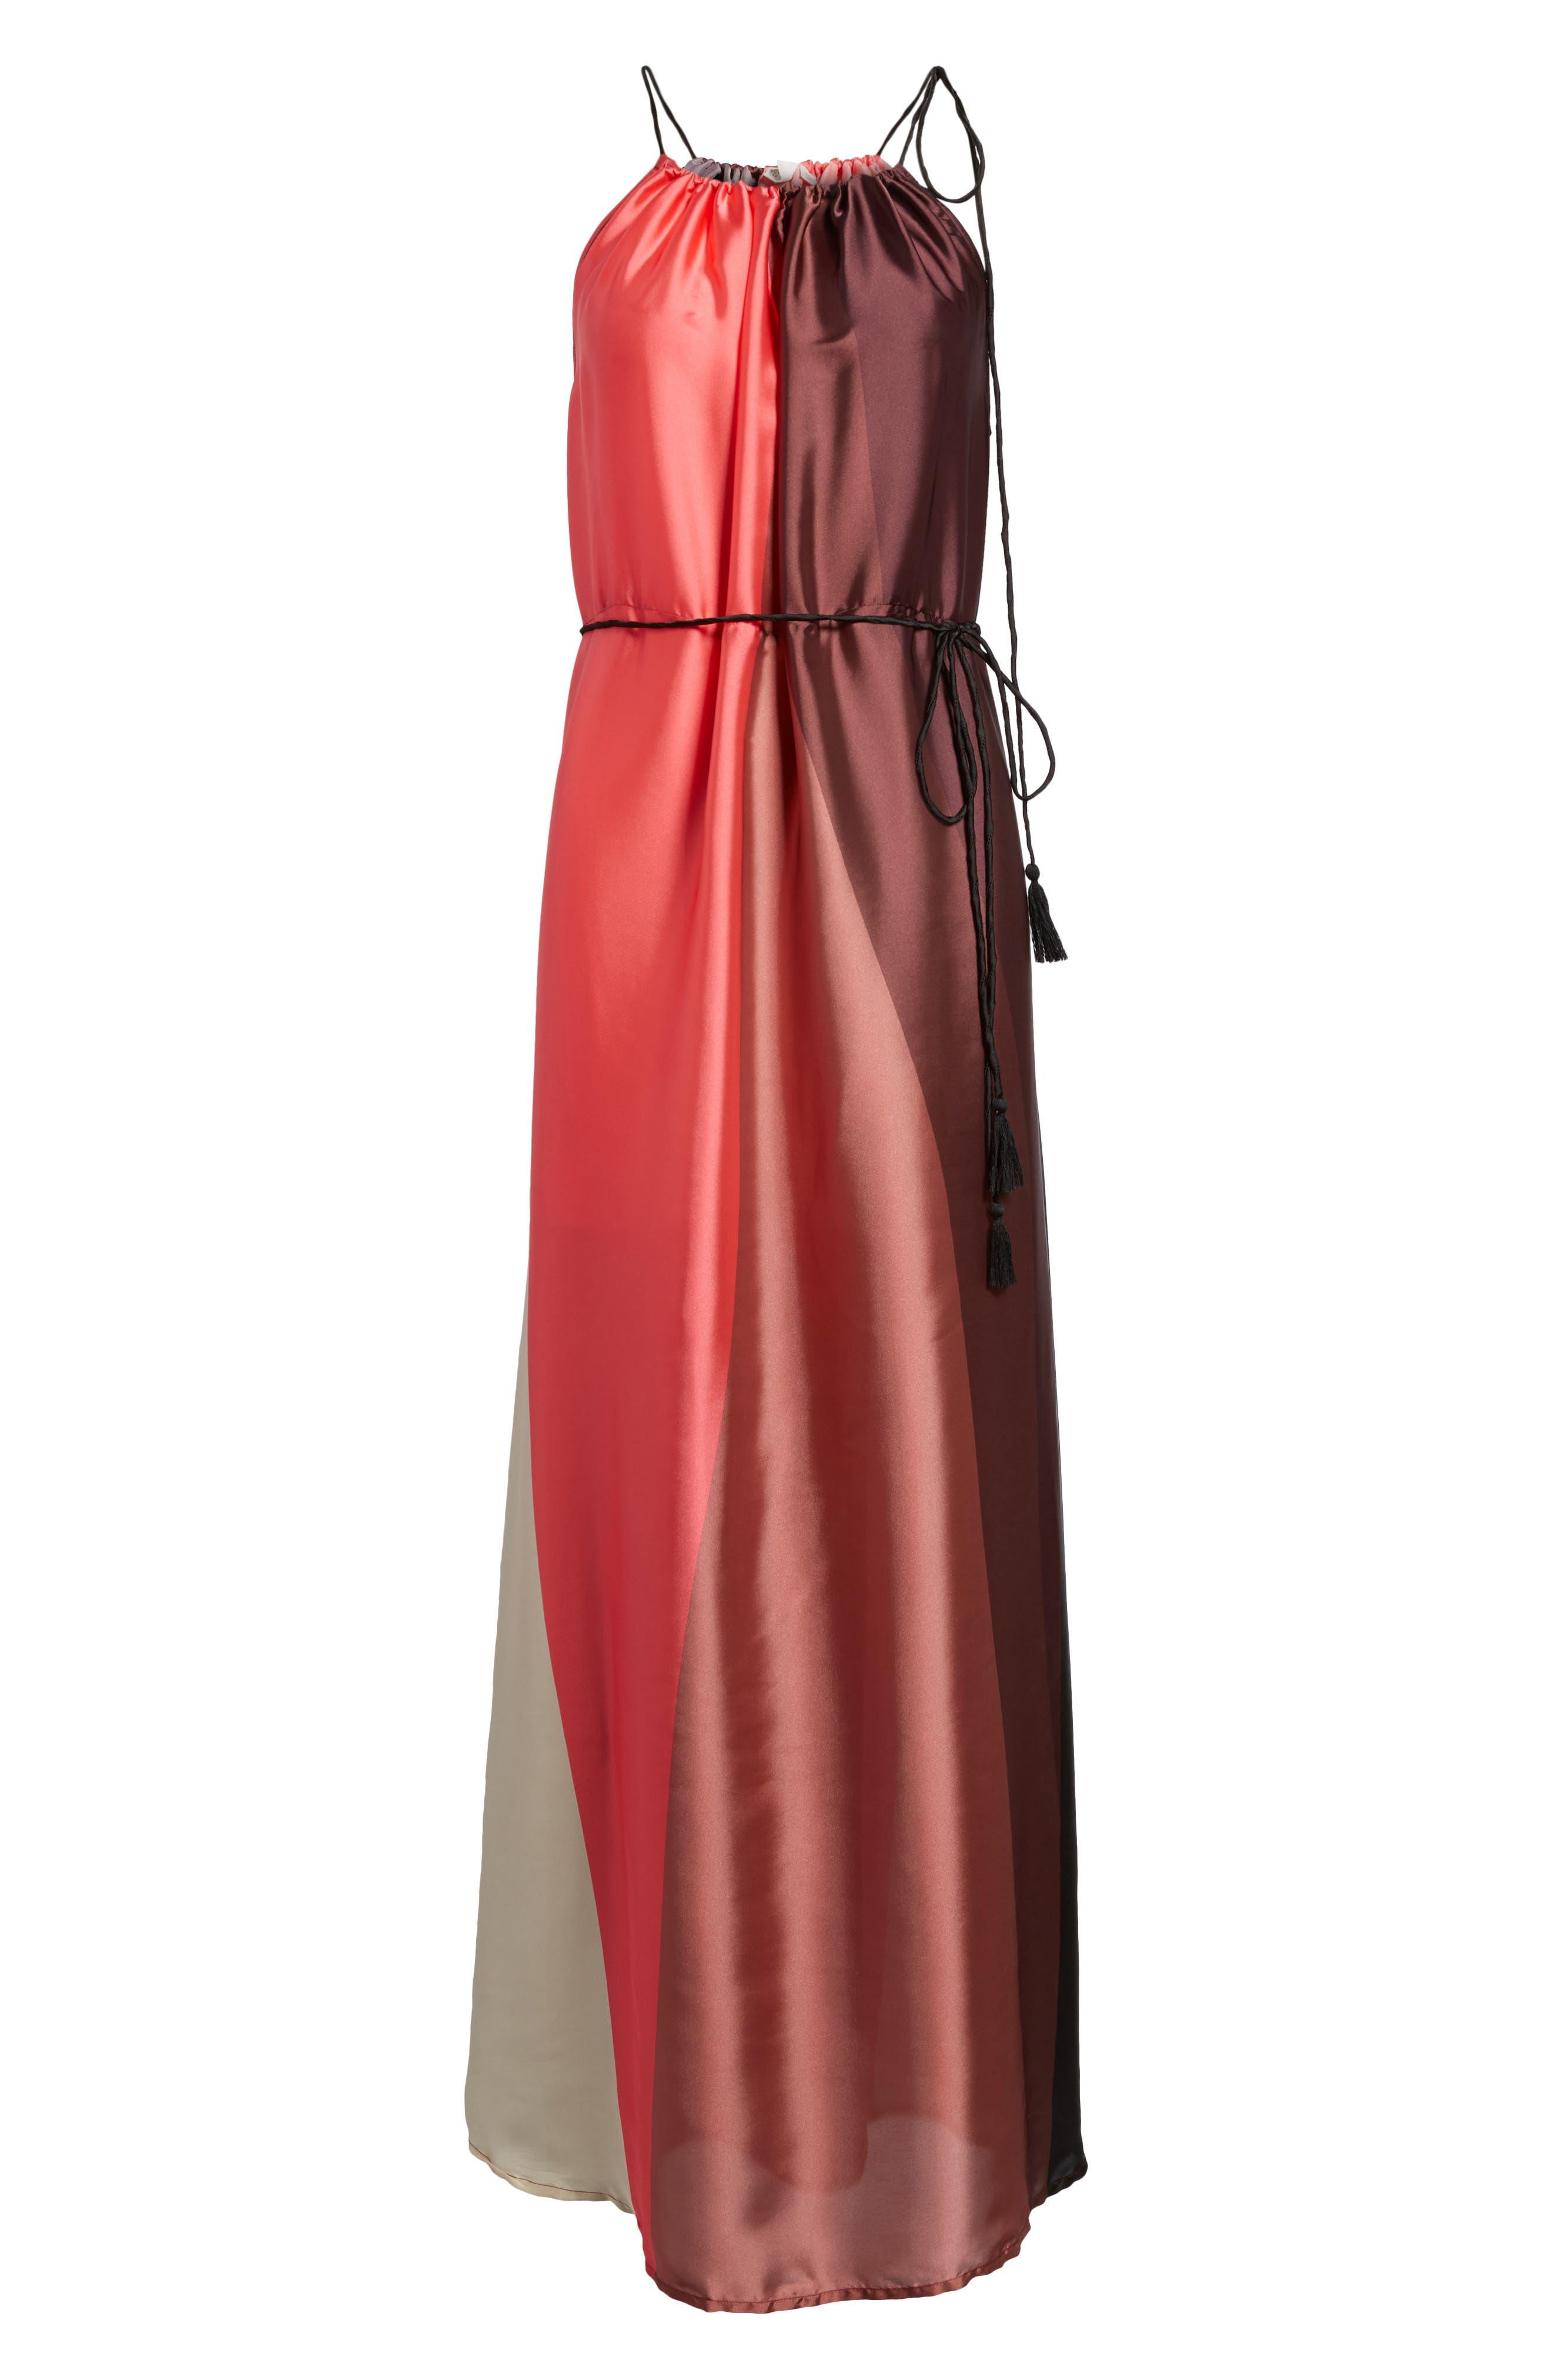 Icy Shores Maxi Dress,                             Alternate thumbnail 6, color,                             903